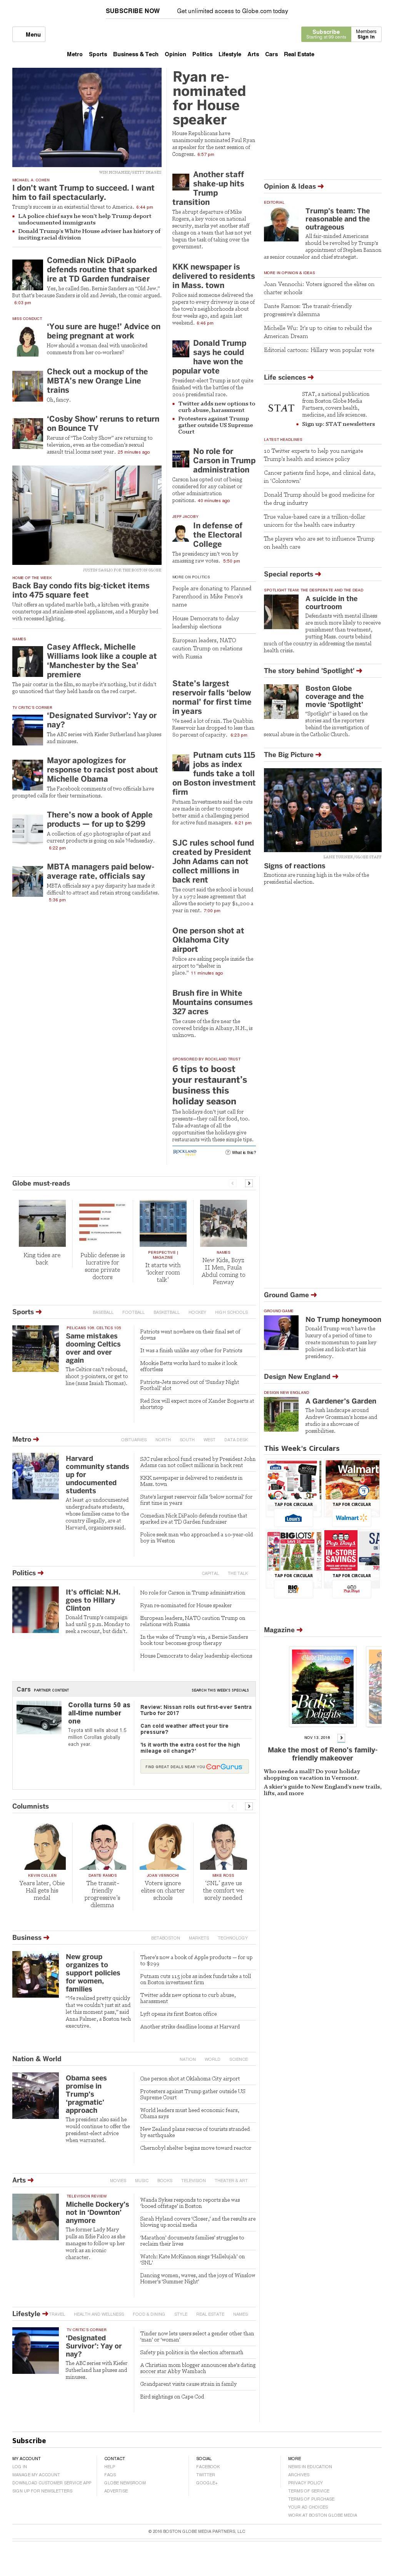 The Boston Globe at Tuesday Nov. 15, 2016, 8:01 p.m. UTC